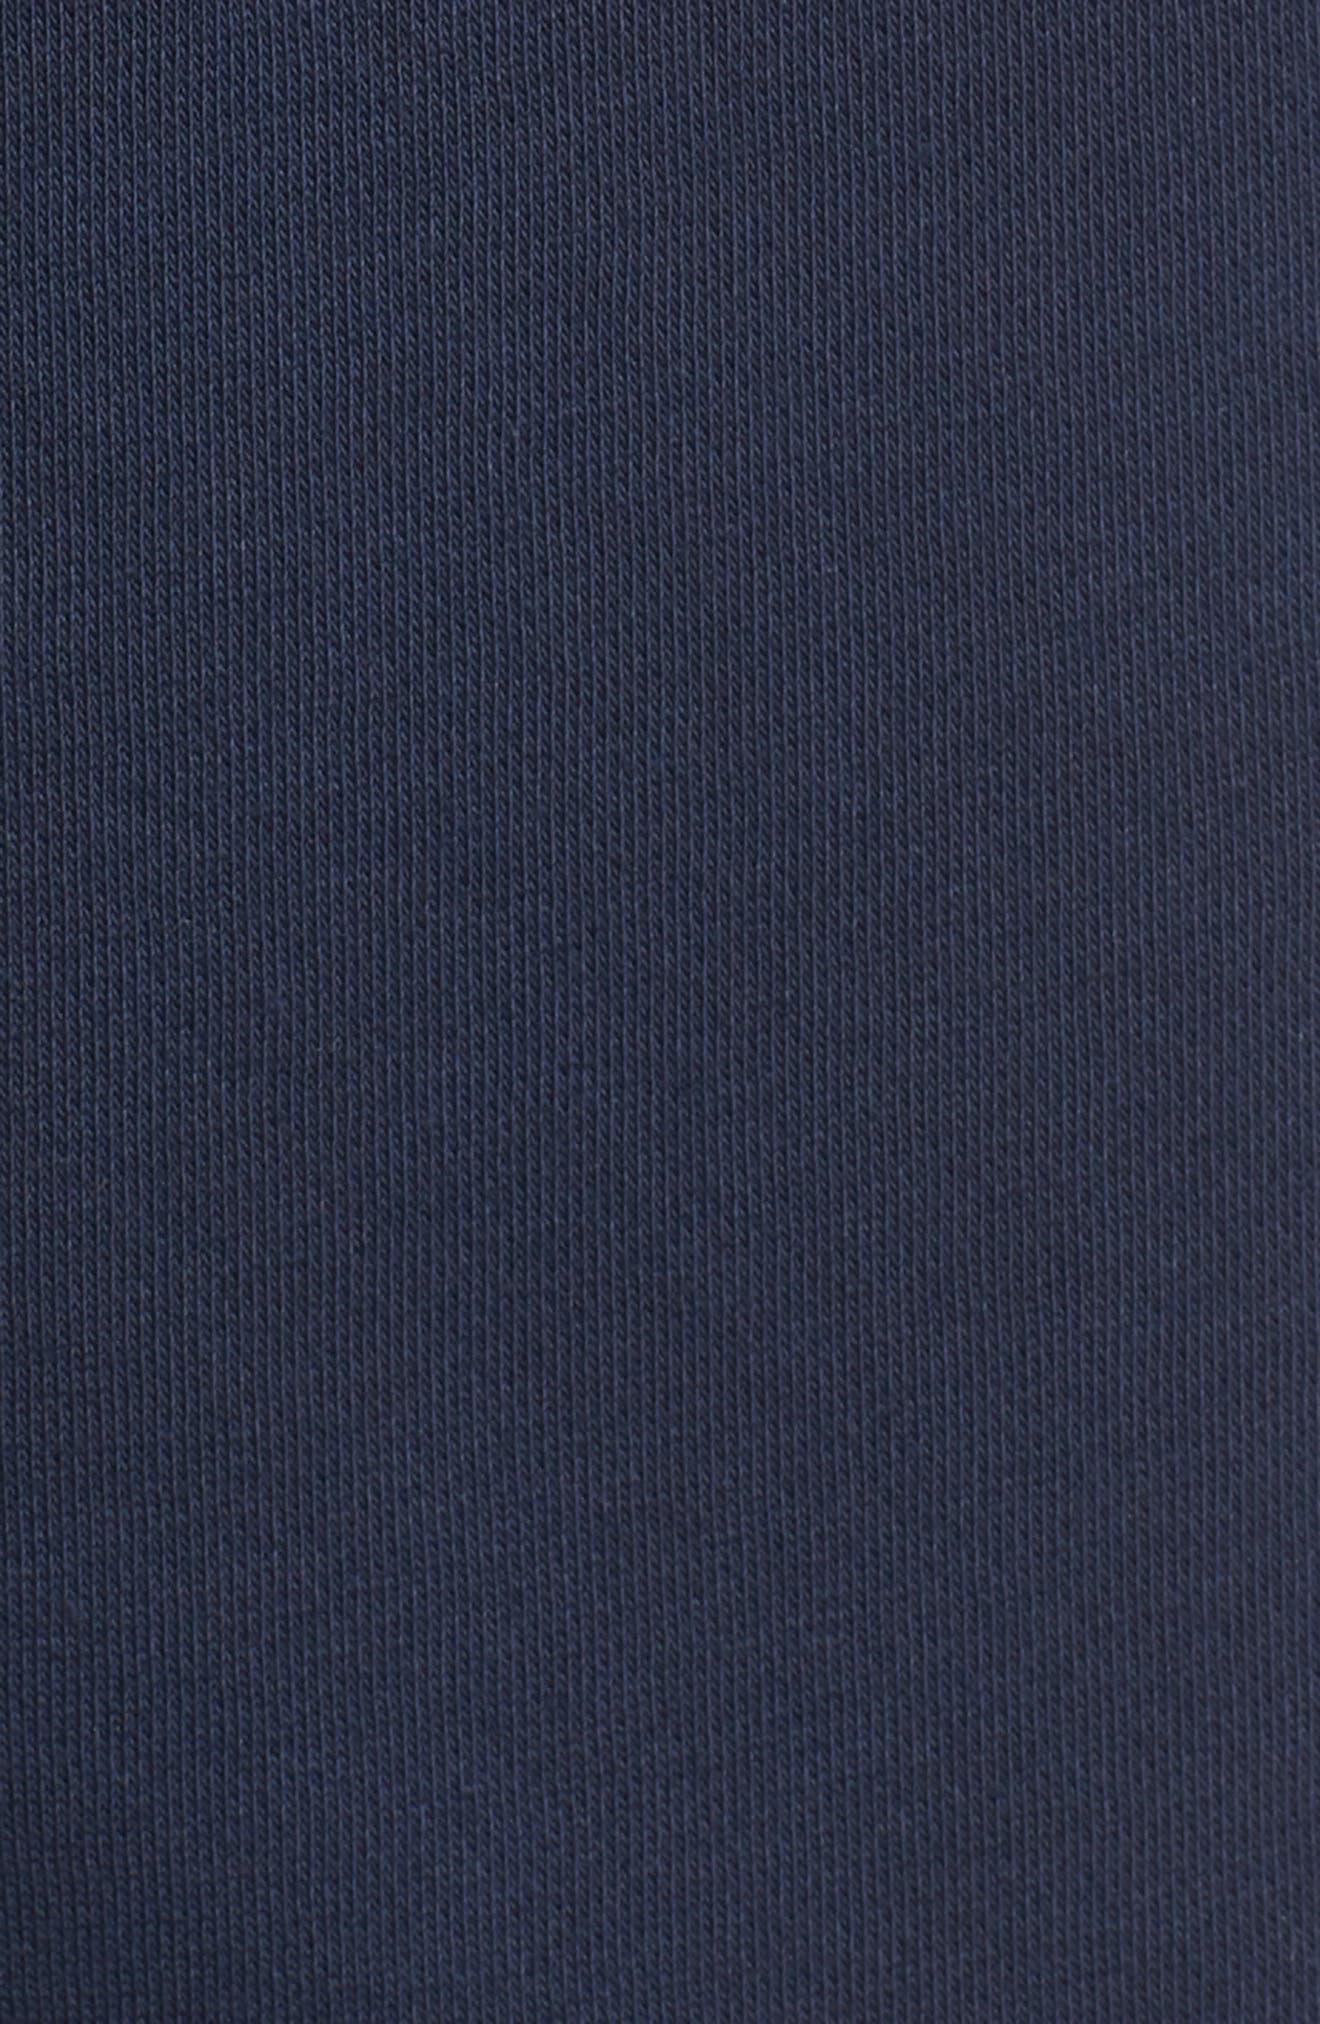 Sportswear Air Fleece Shorts,                             Alternate thumbnail 5, color,                             452